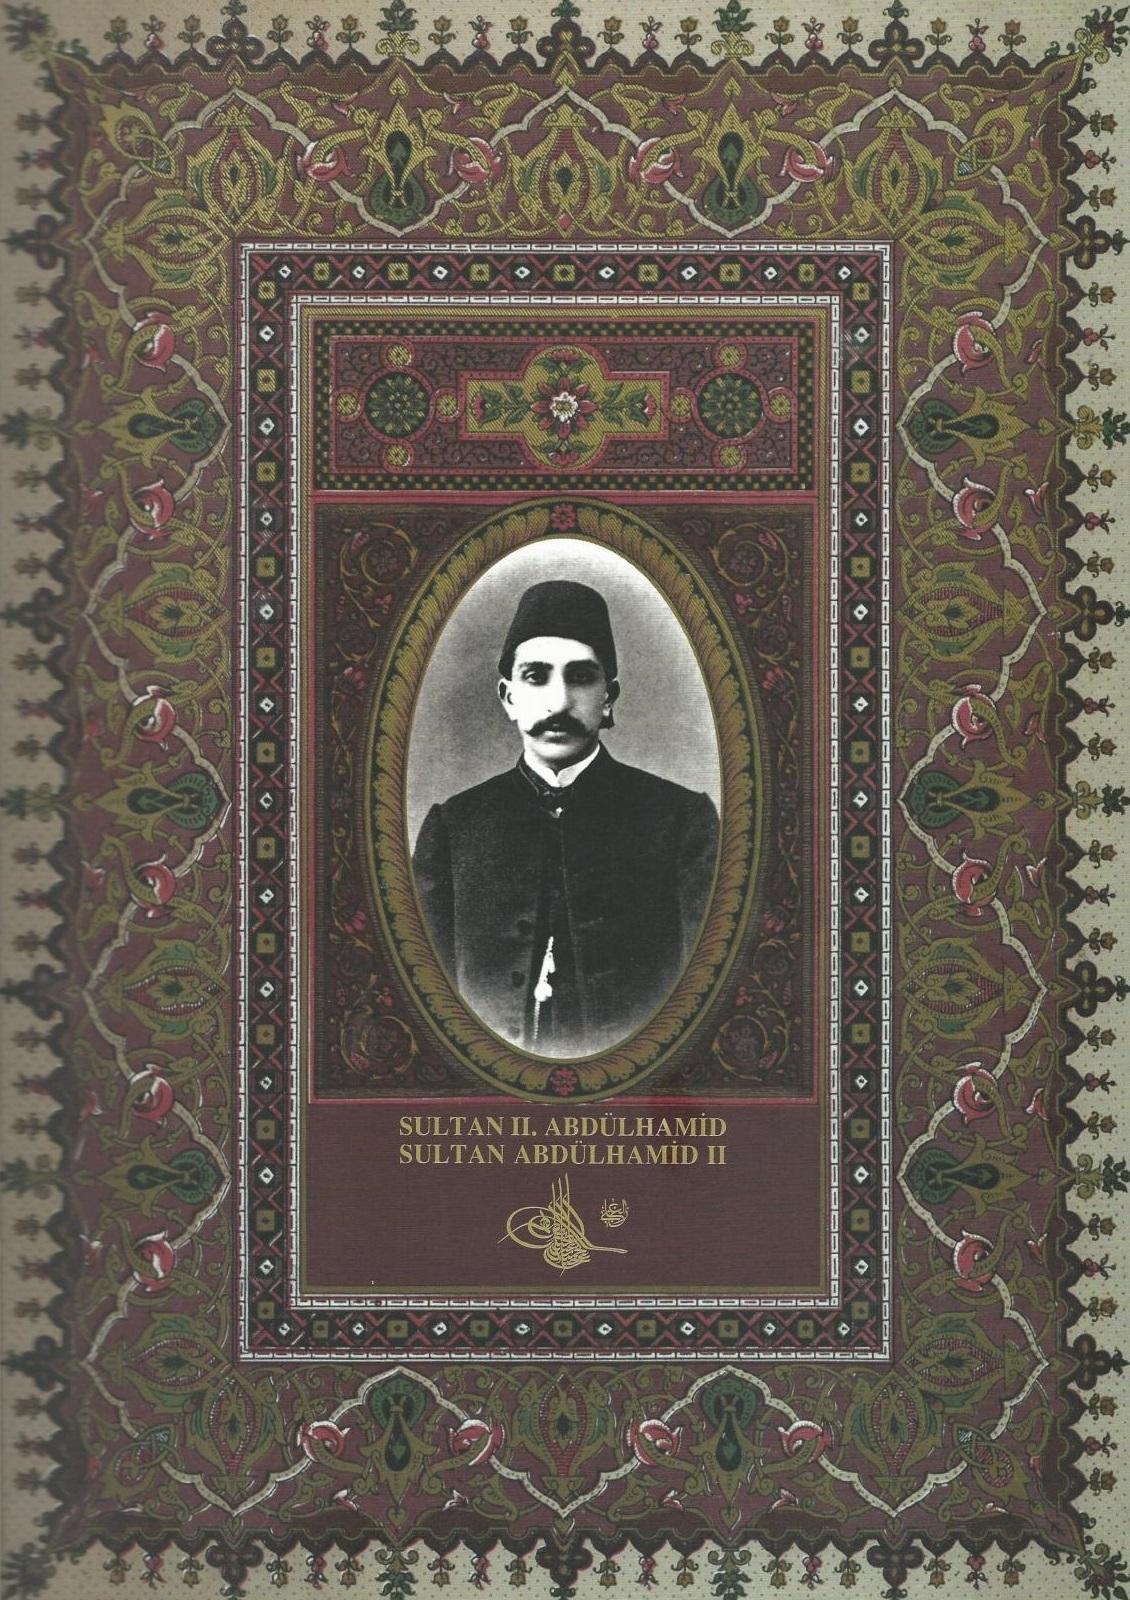 0369-sultan-abdulhamid-vefatinin-100-yili-yedi-kita-dergisi-abdulhamid-belgeseli (1)